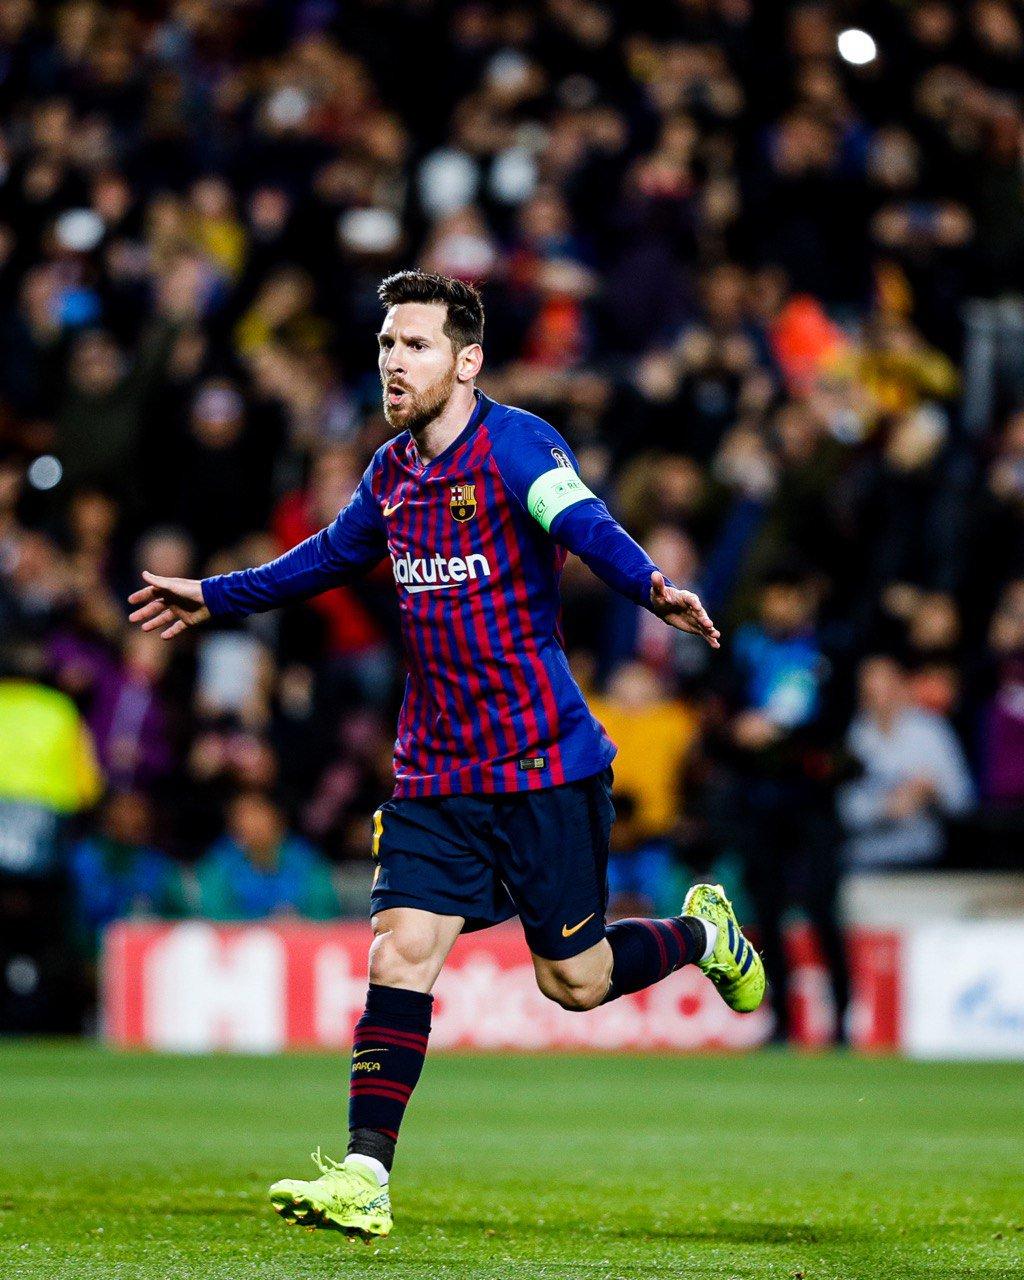 �� #Messi �� ���� #BarçaOL #ForçaBarça https://t.co/1obEVNmRnJ